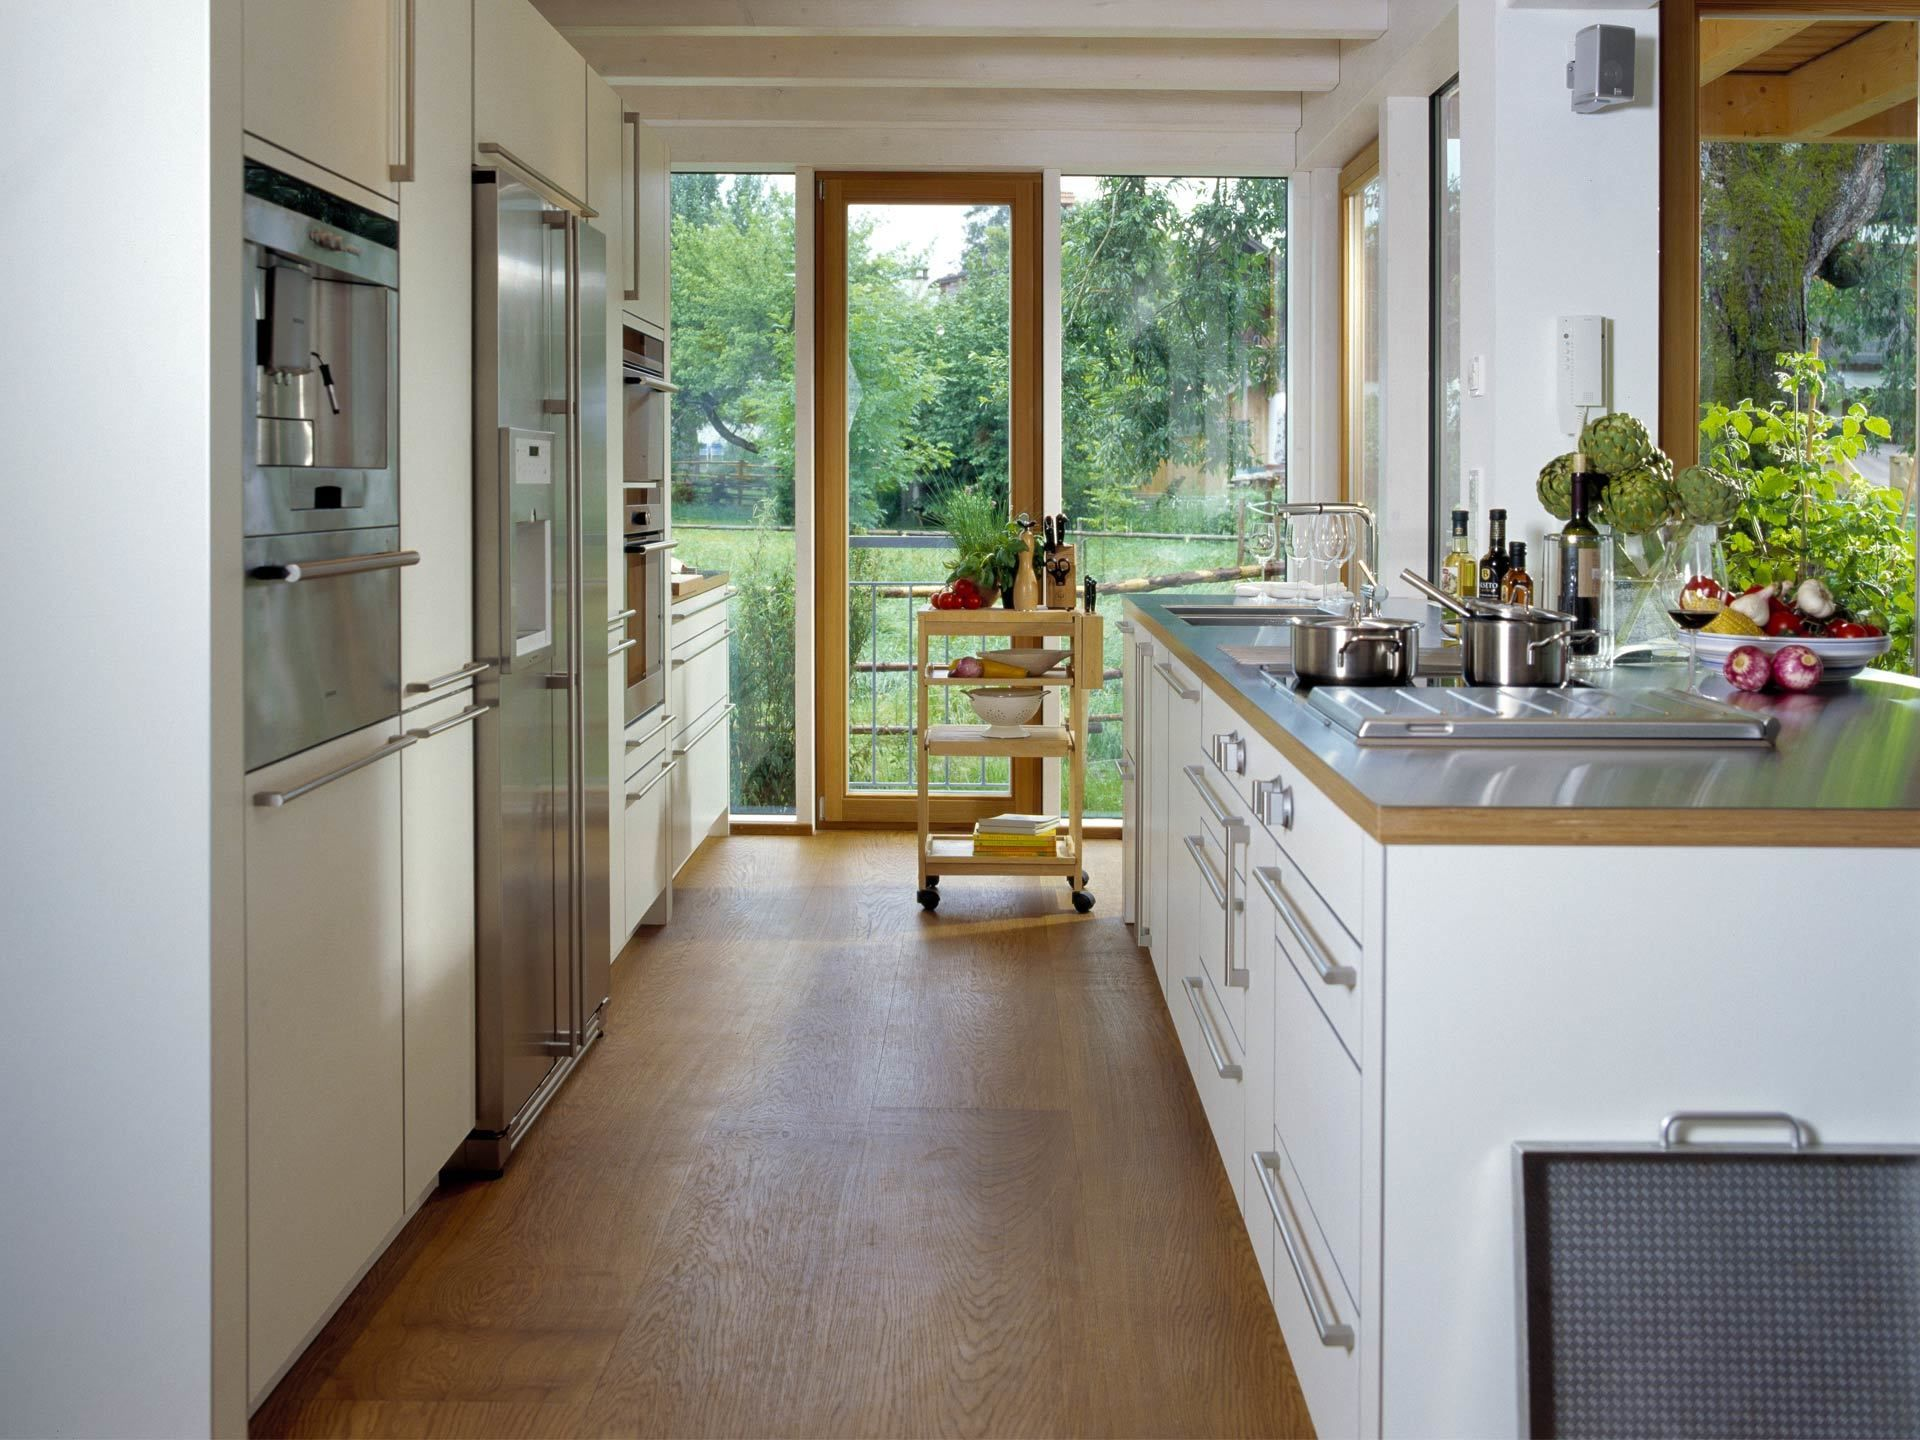 Küchenarbeitsplatte Bauhaus ~ Best küche images bauhaus benefits of and